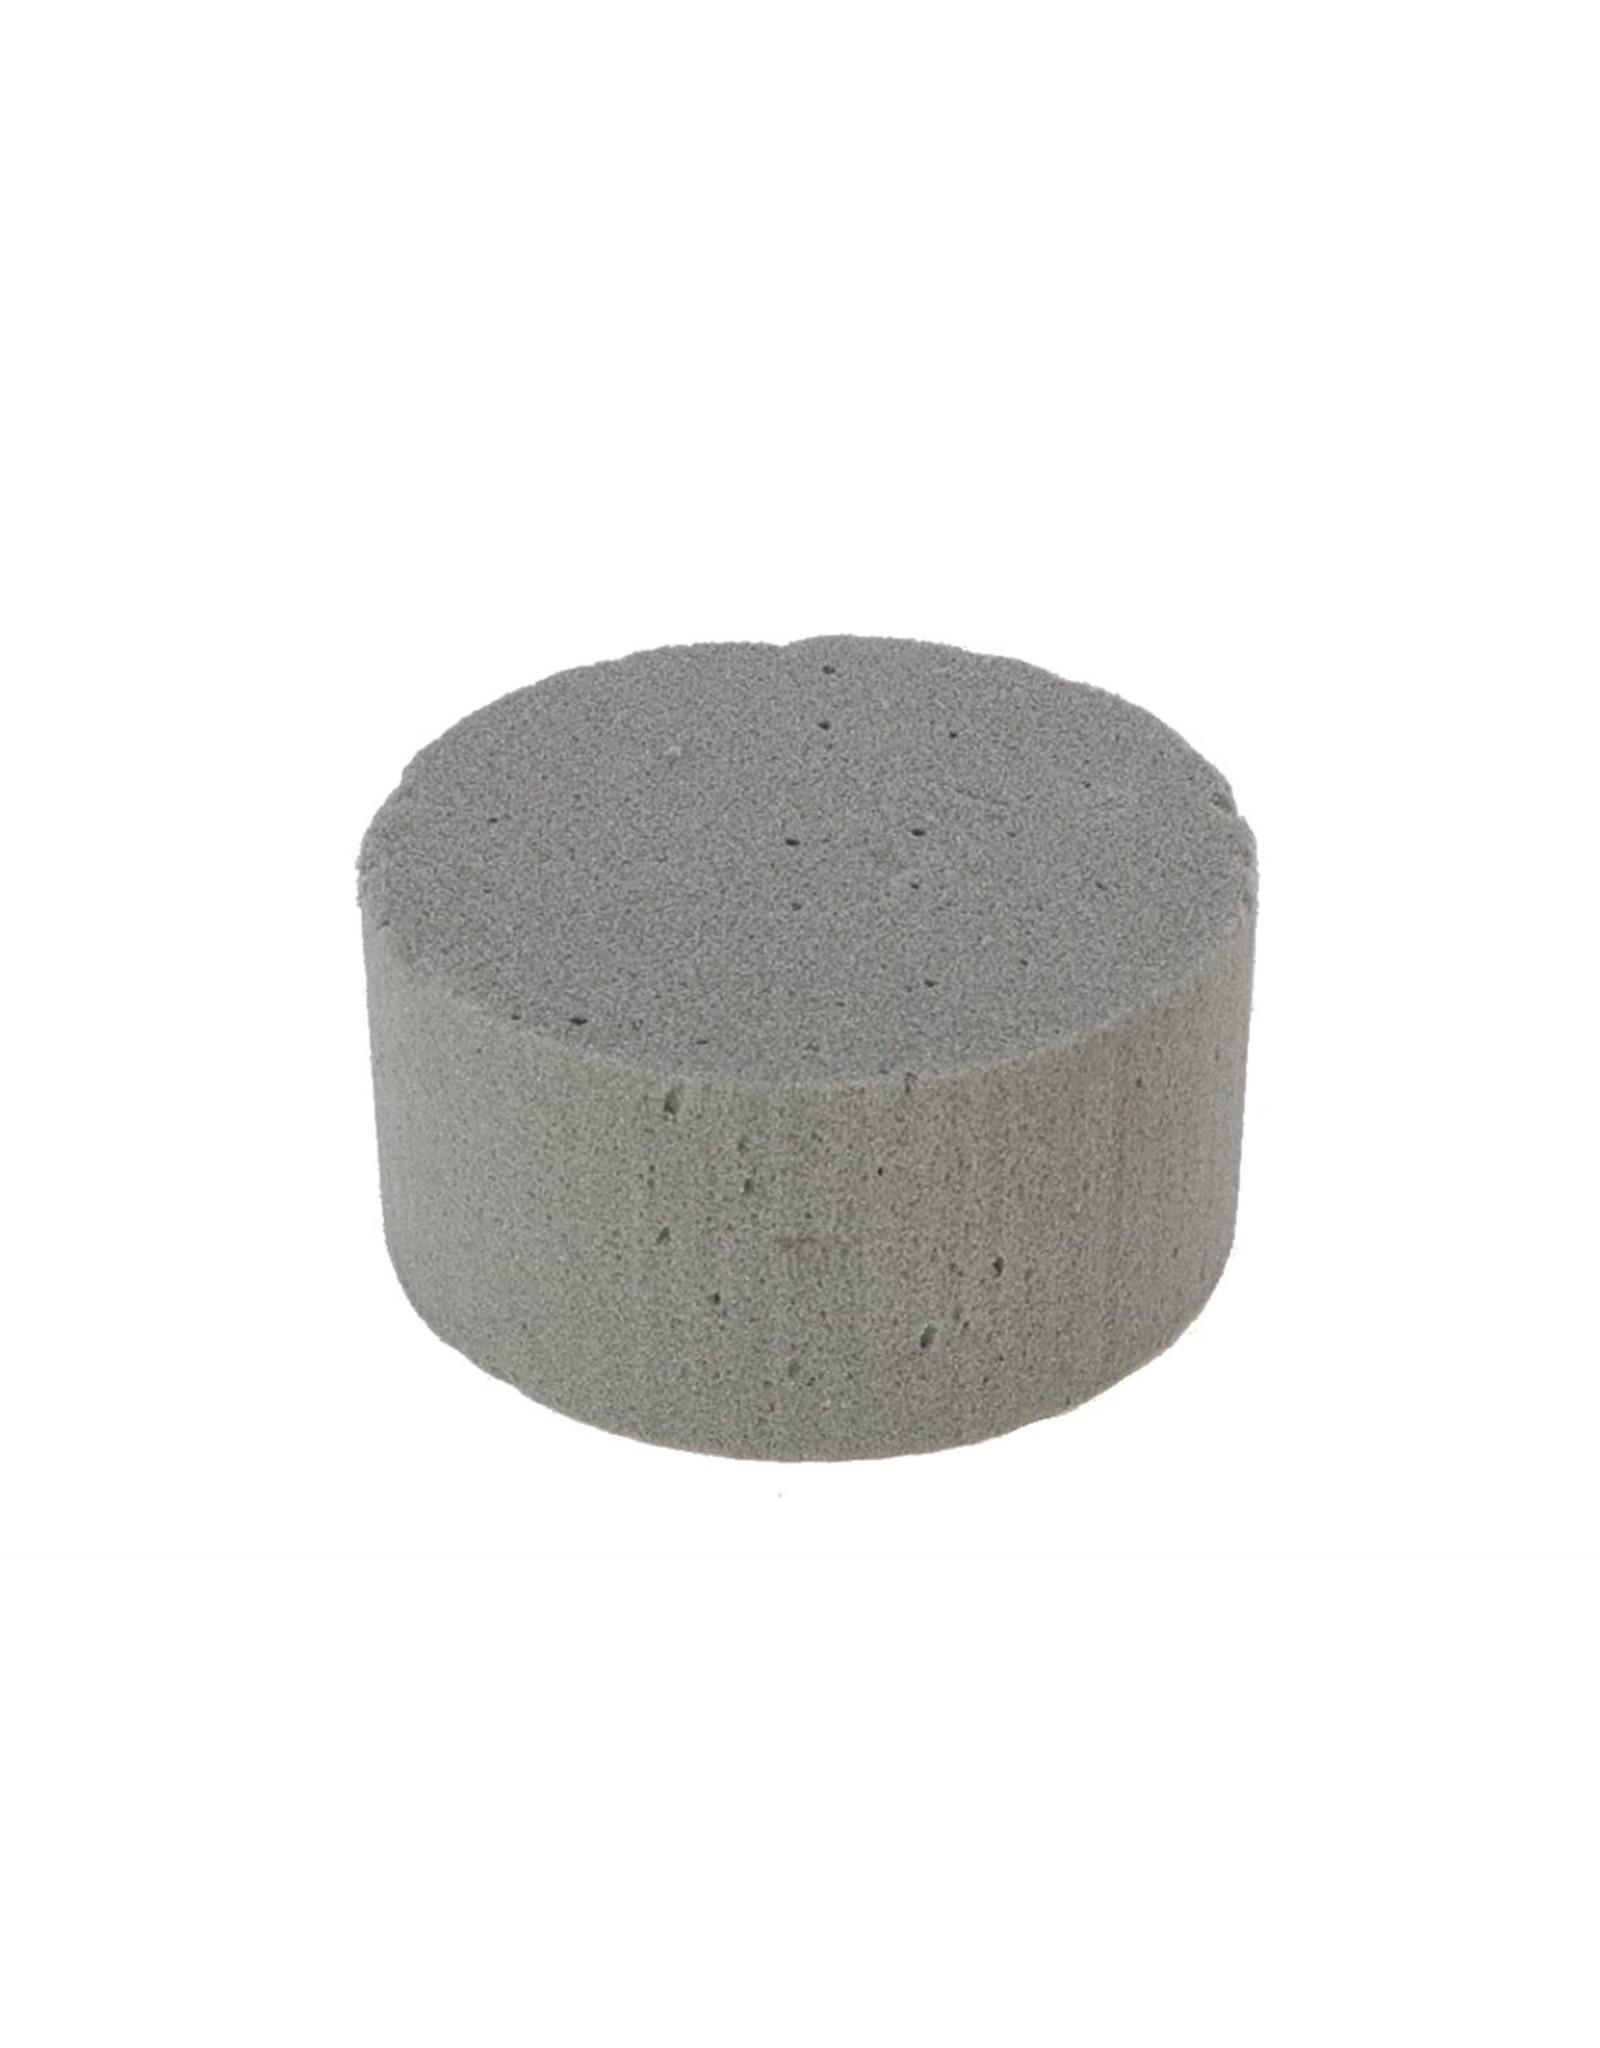 HD Basic Cake Dry Sld Foam D14.0h7.0 x 24